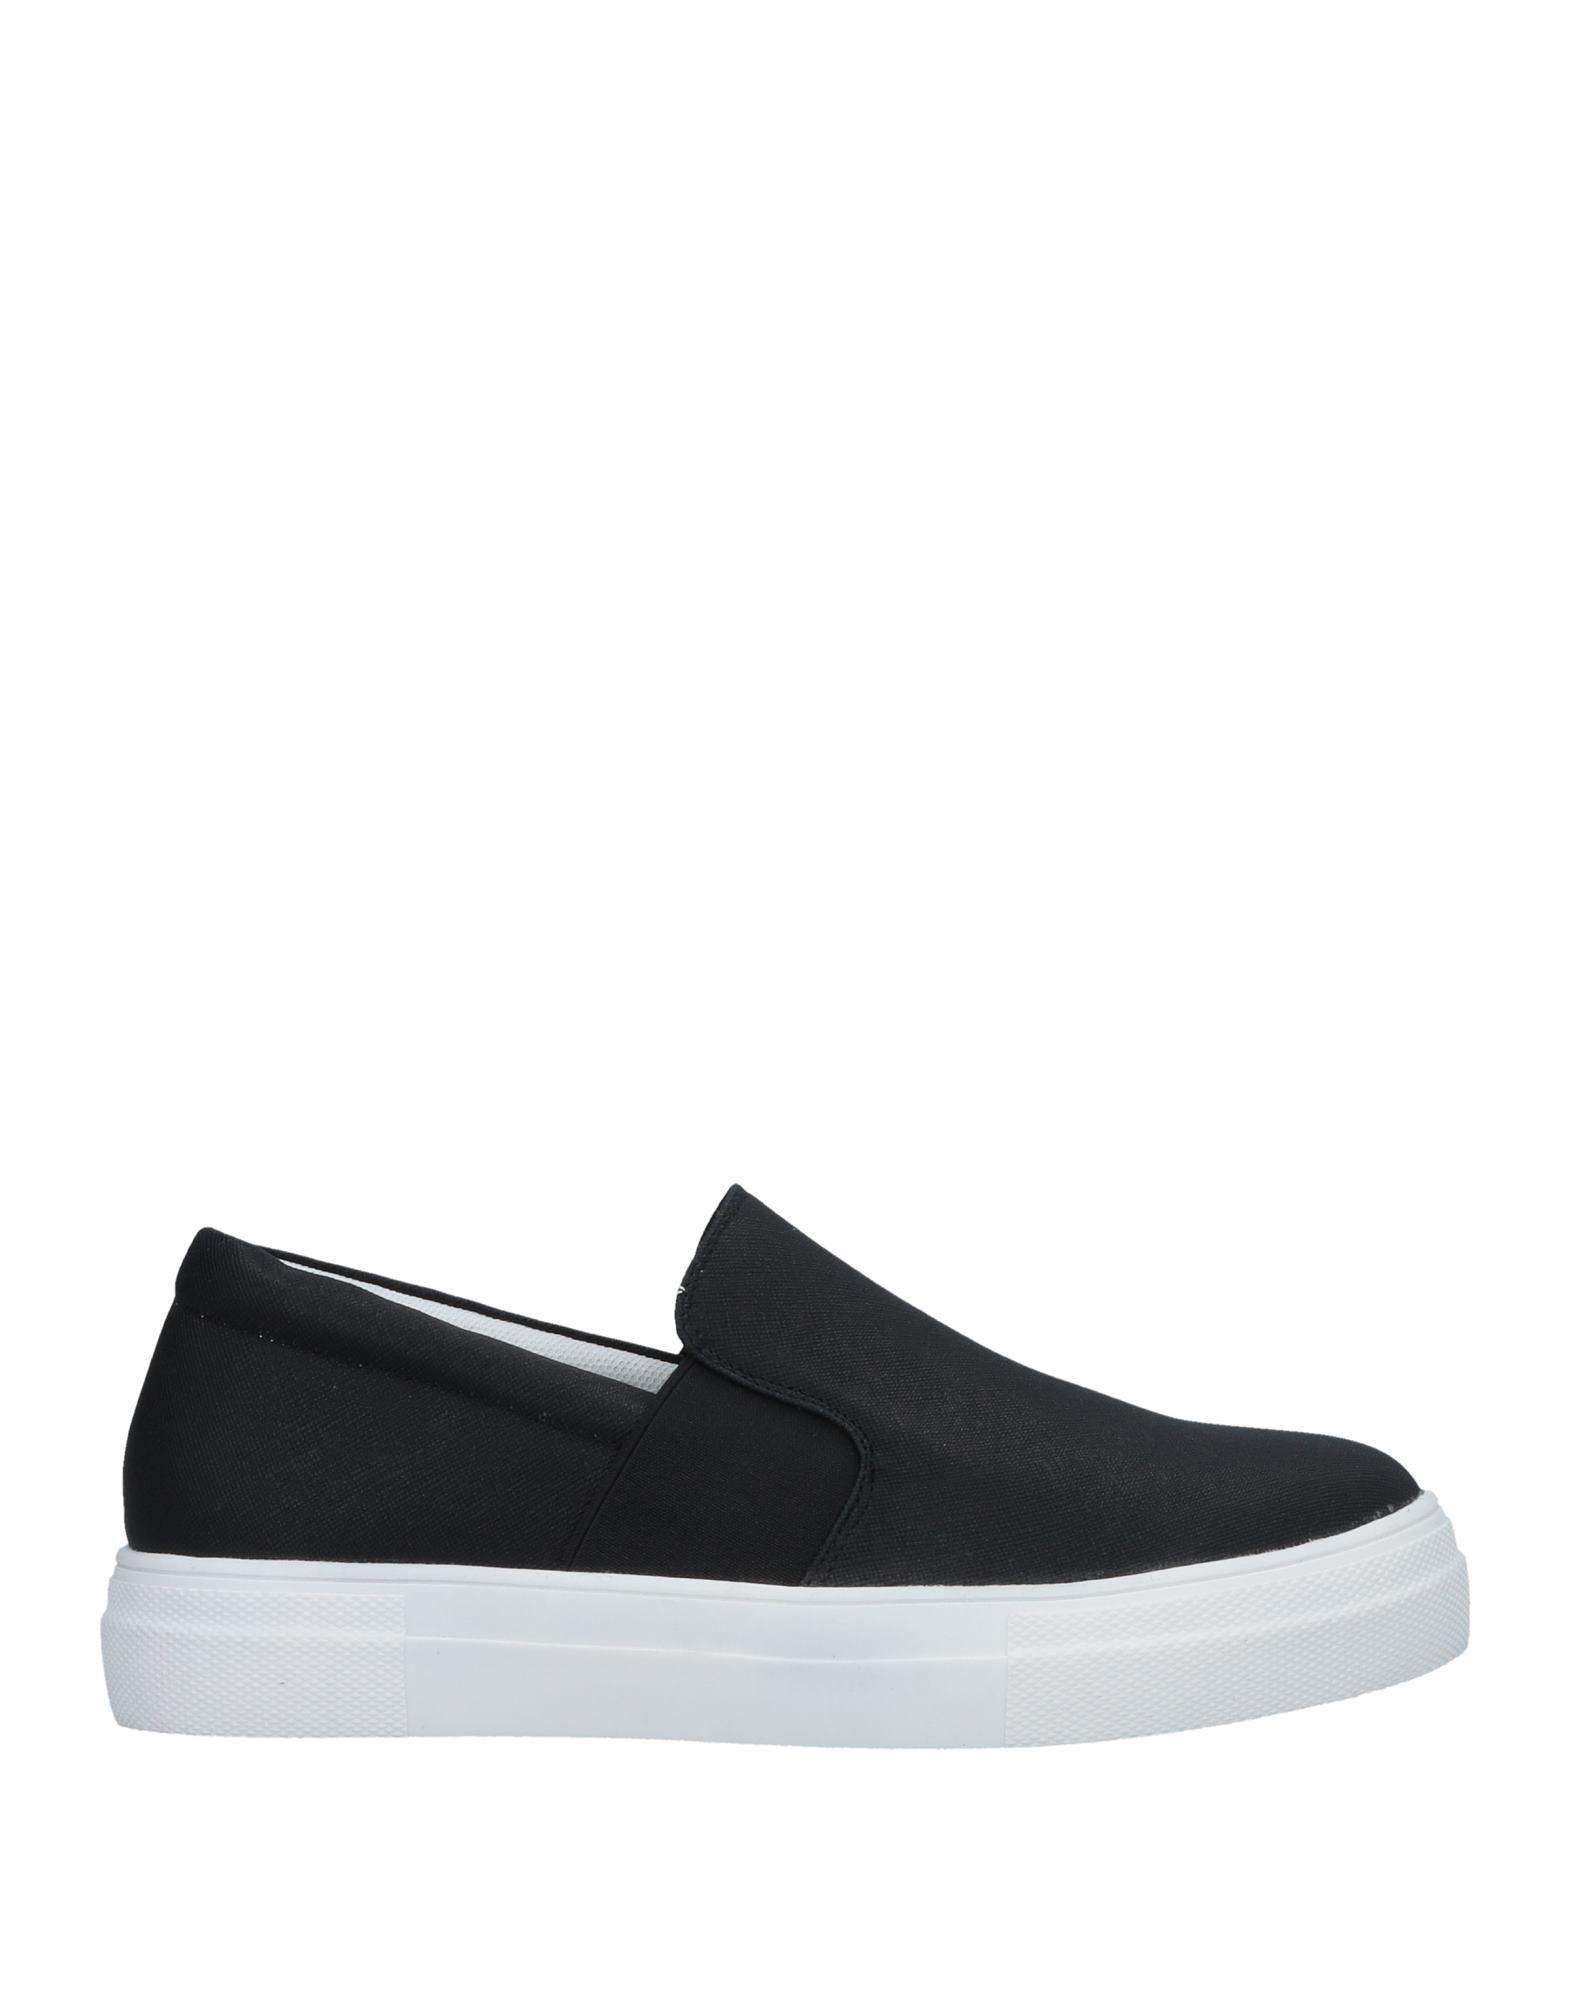 Sneakers Mauro Fedeli Donna - 11506169WH